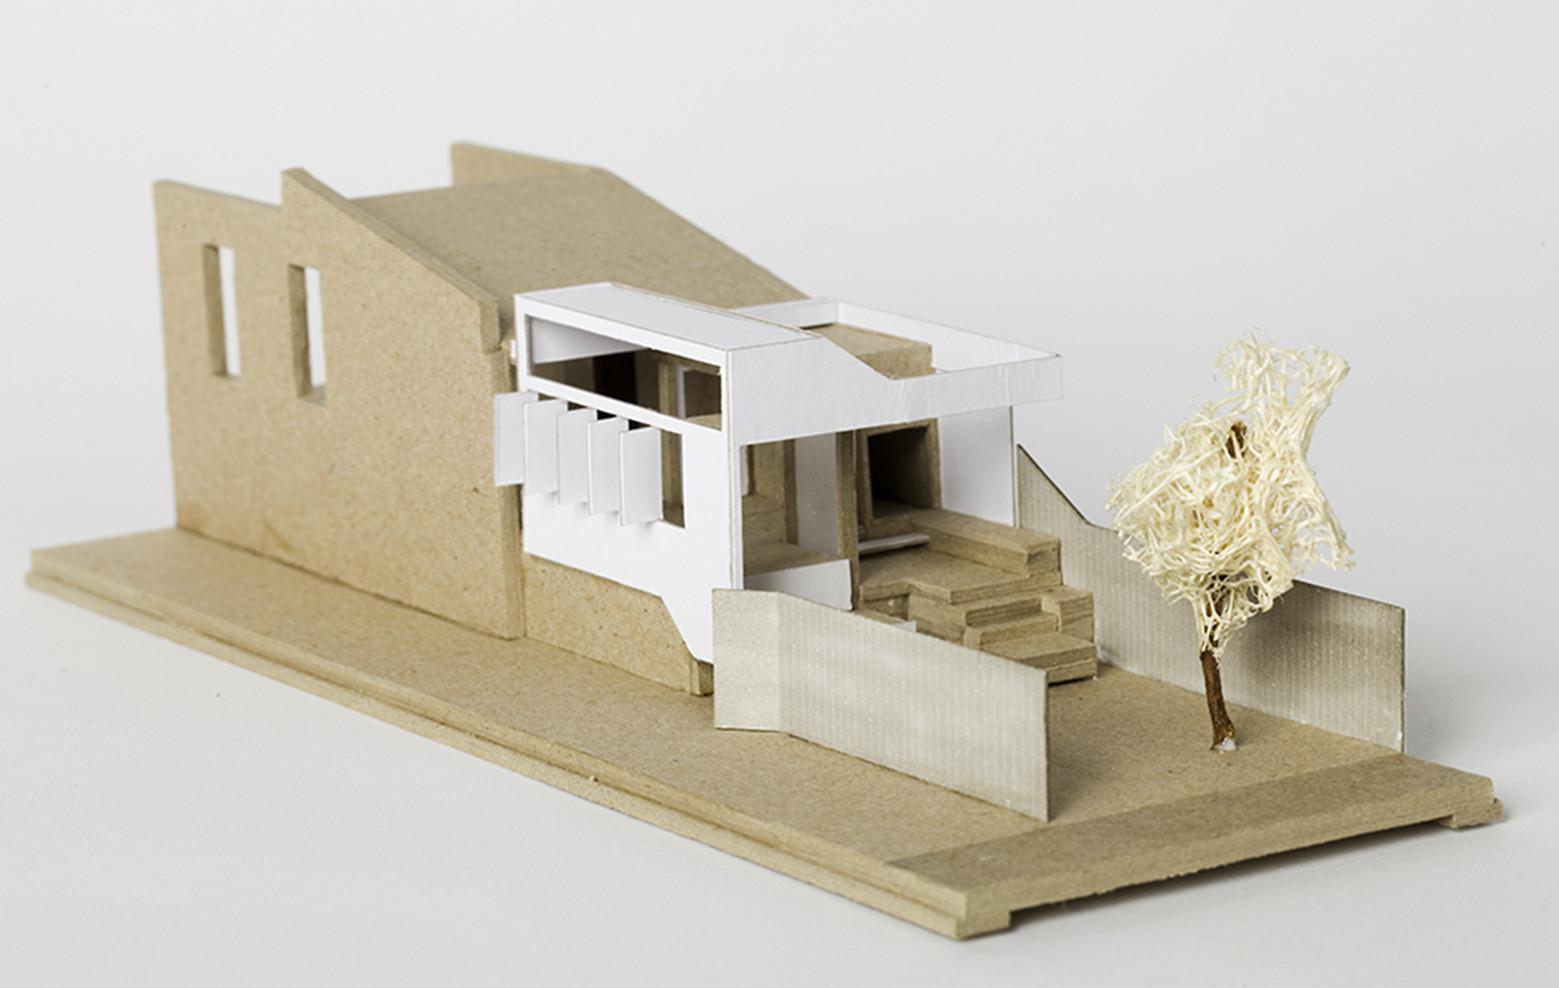 Gallery of bellevue terrace extension philip stejskal for Extension architecte